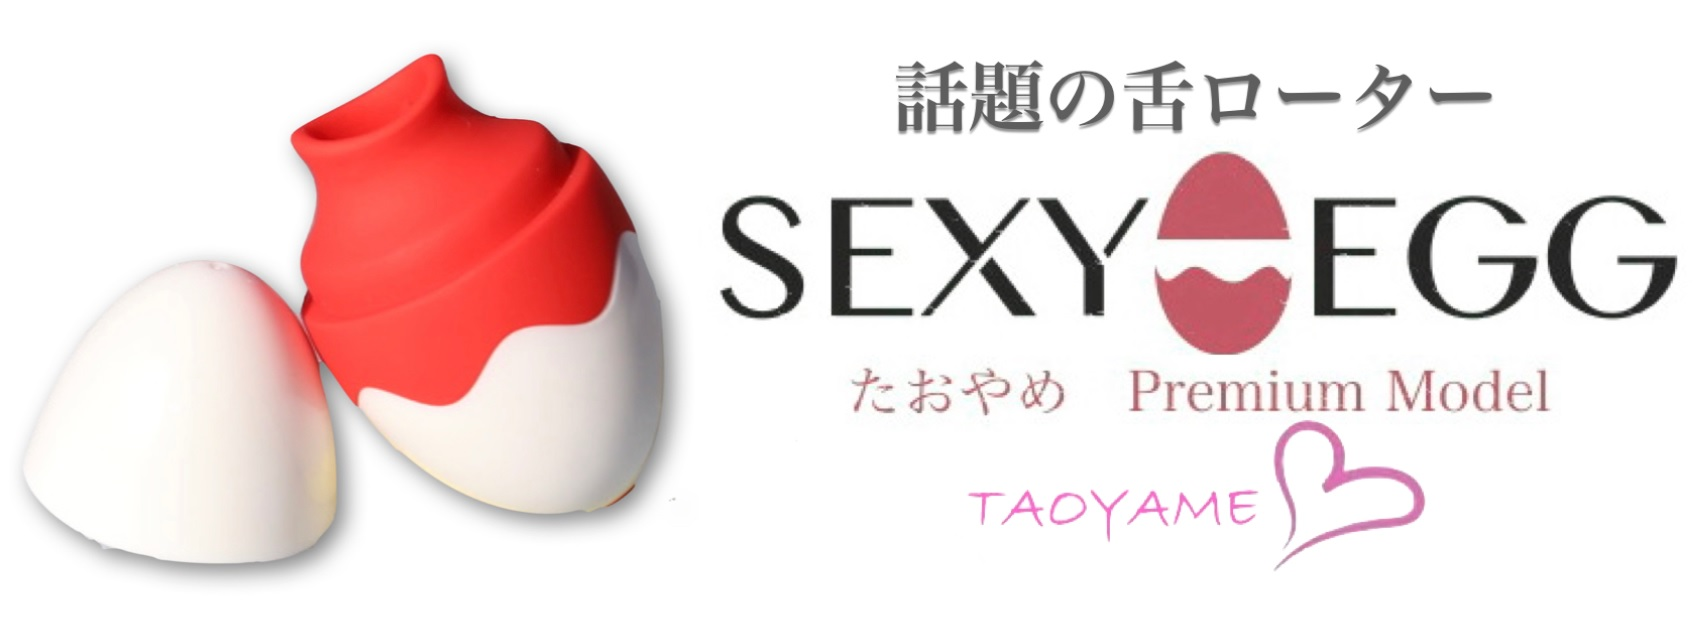 SEXYEGG(セクシーエッグ)の口コミ・評判情報を総まとめ!